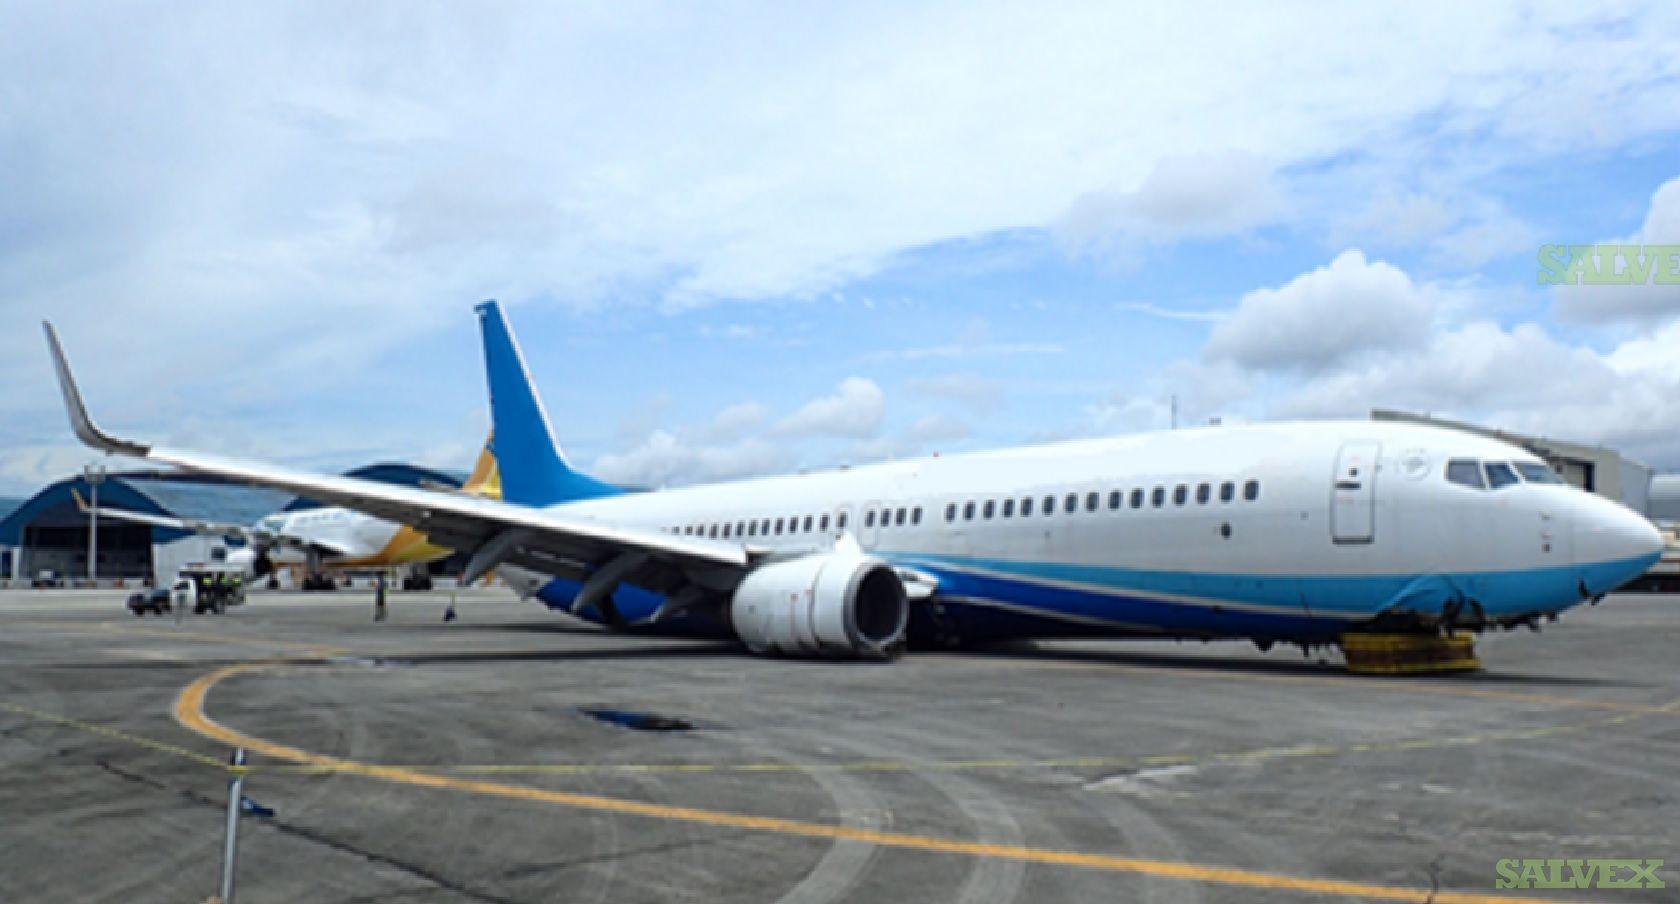 Boeing 737-800 Year 2010 (1 Plane)